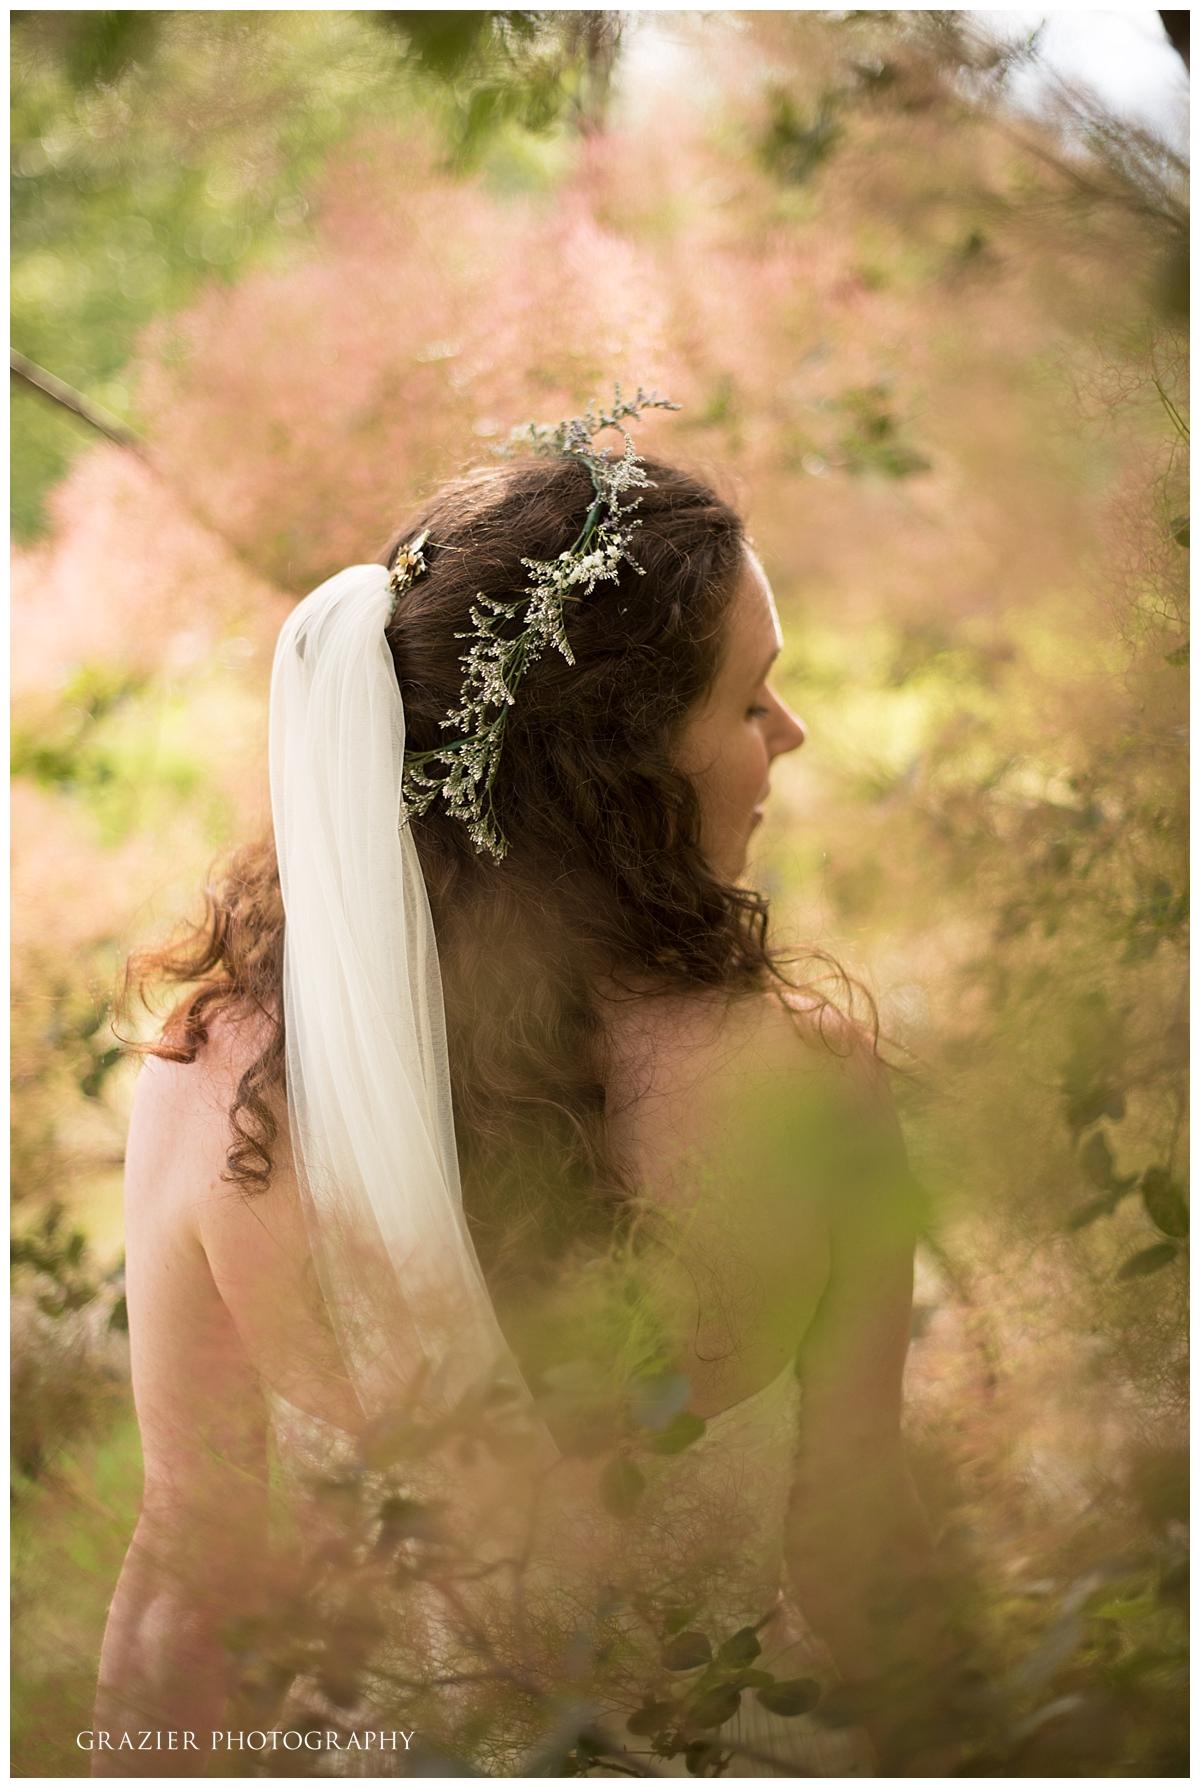 Tyrone Farm Wedding Grazier Photography 2017-45_WEB.jpg